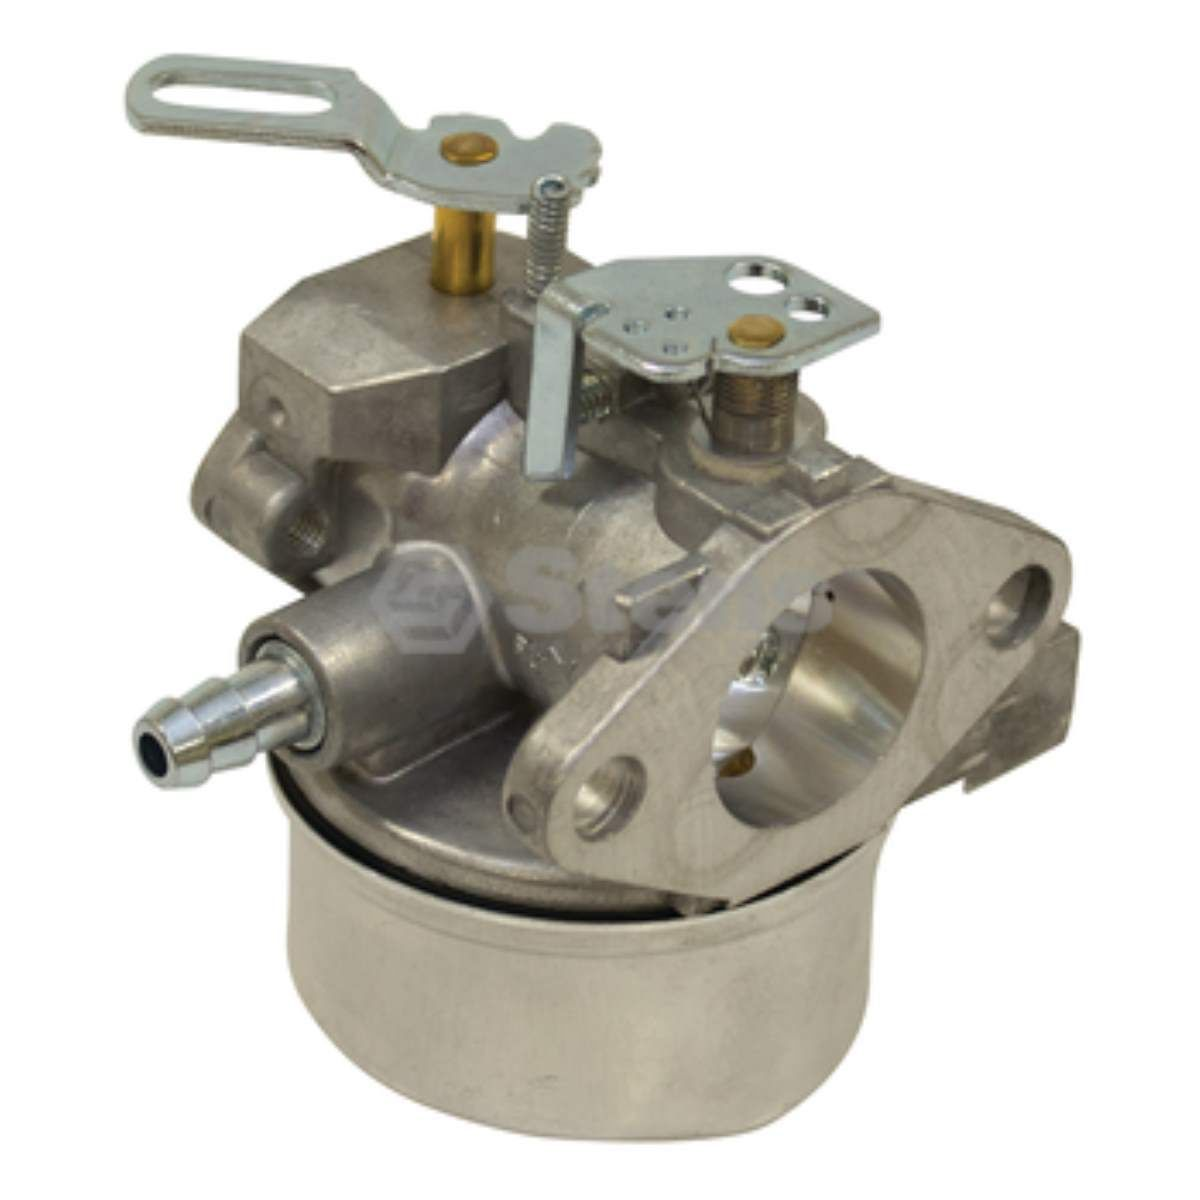 Carburetor Tecumseh 640052, 640054, 640349 HMSK80, HMSK85 and HMSK90 Aftermarket